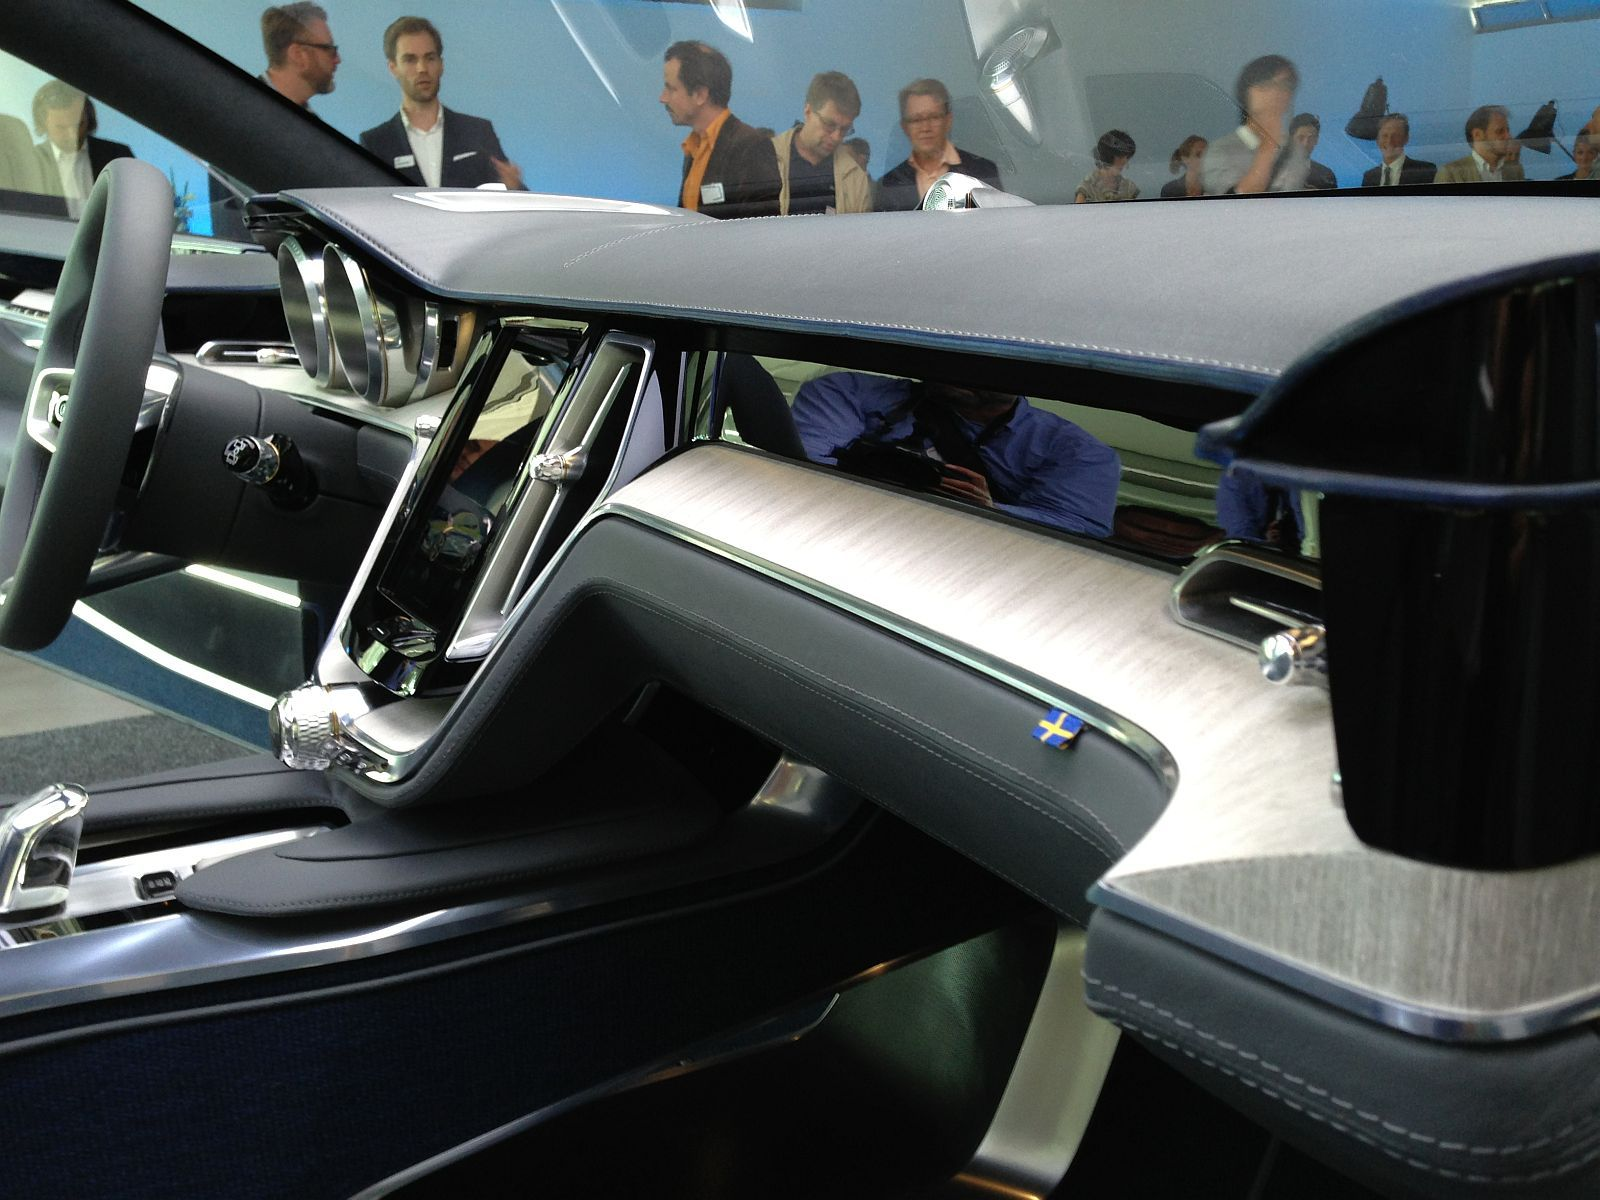 Cars car interior design volvo cars hot cars forget dream cars